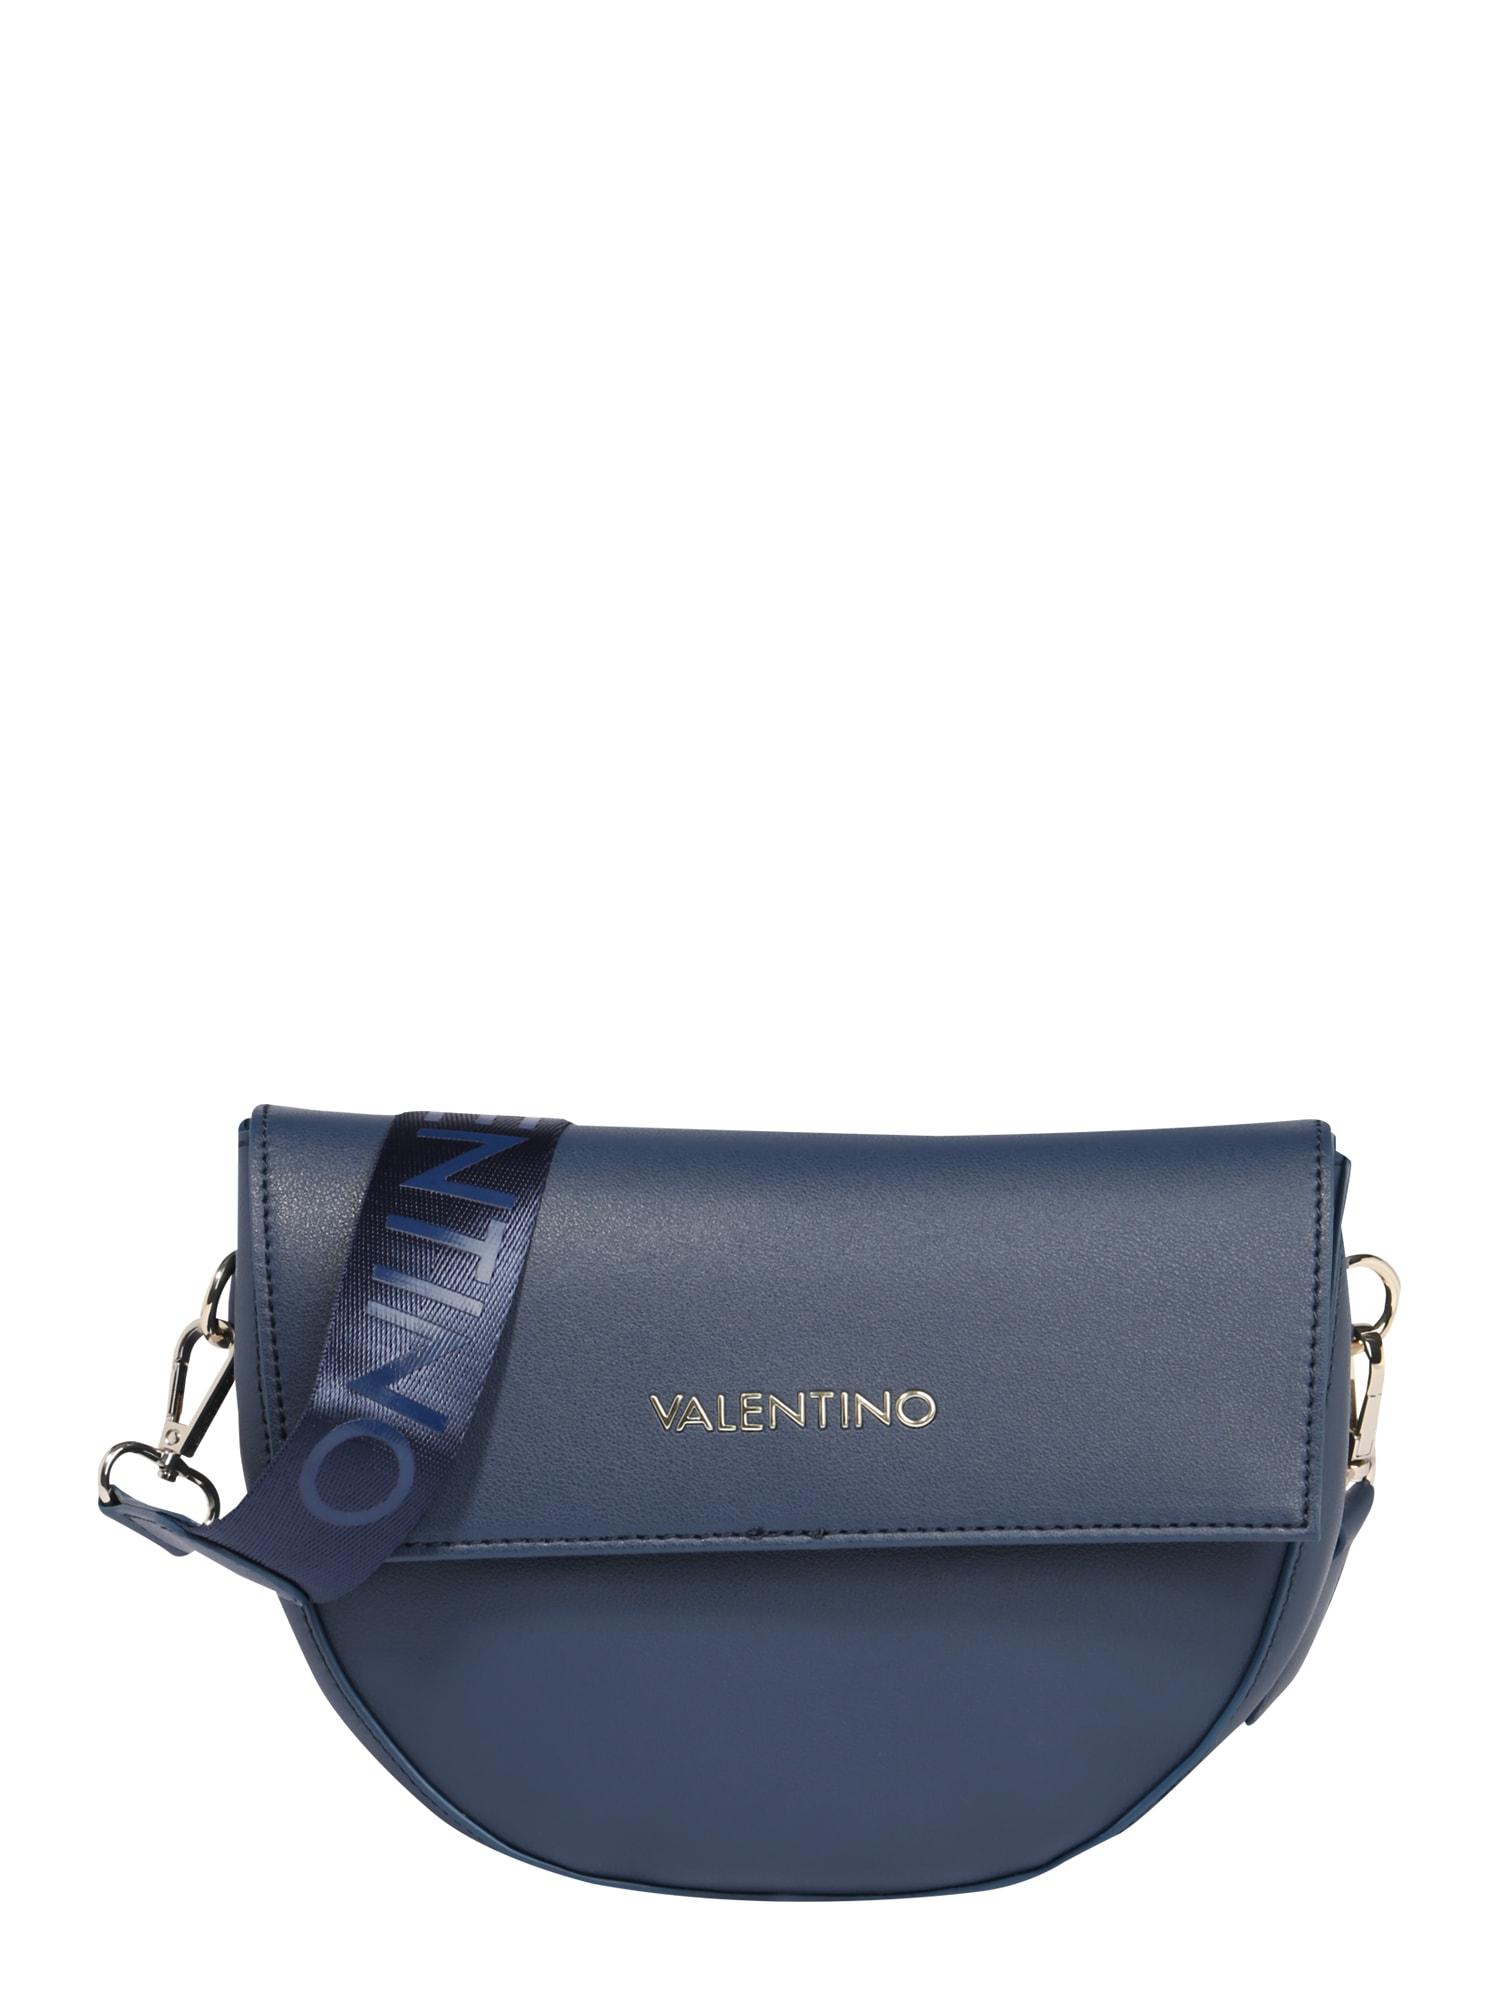 Valentino by Mario Valentino Taška přes rameno 'BIGS'  marine modrá